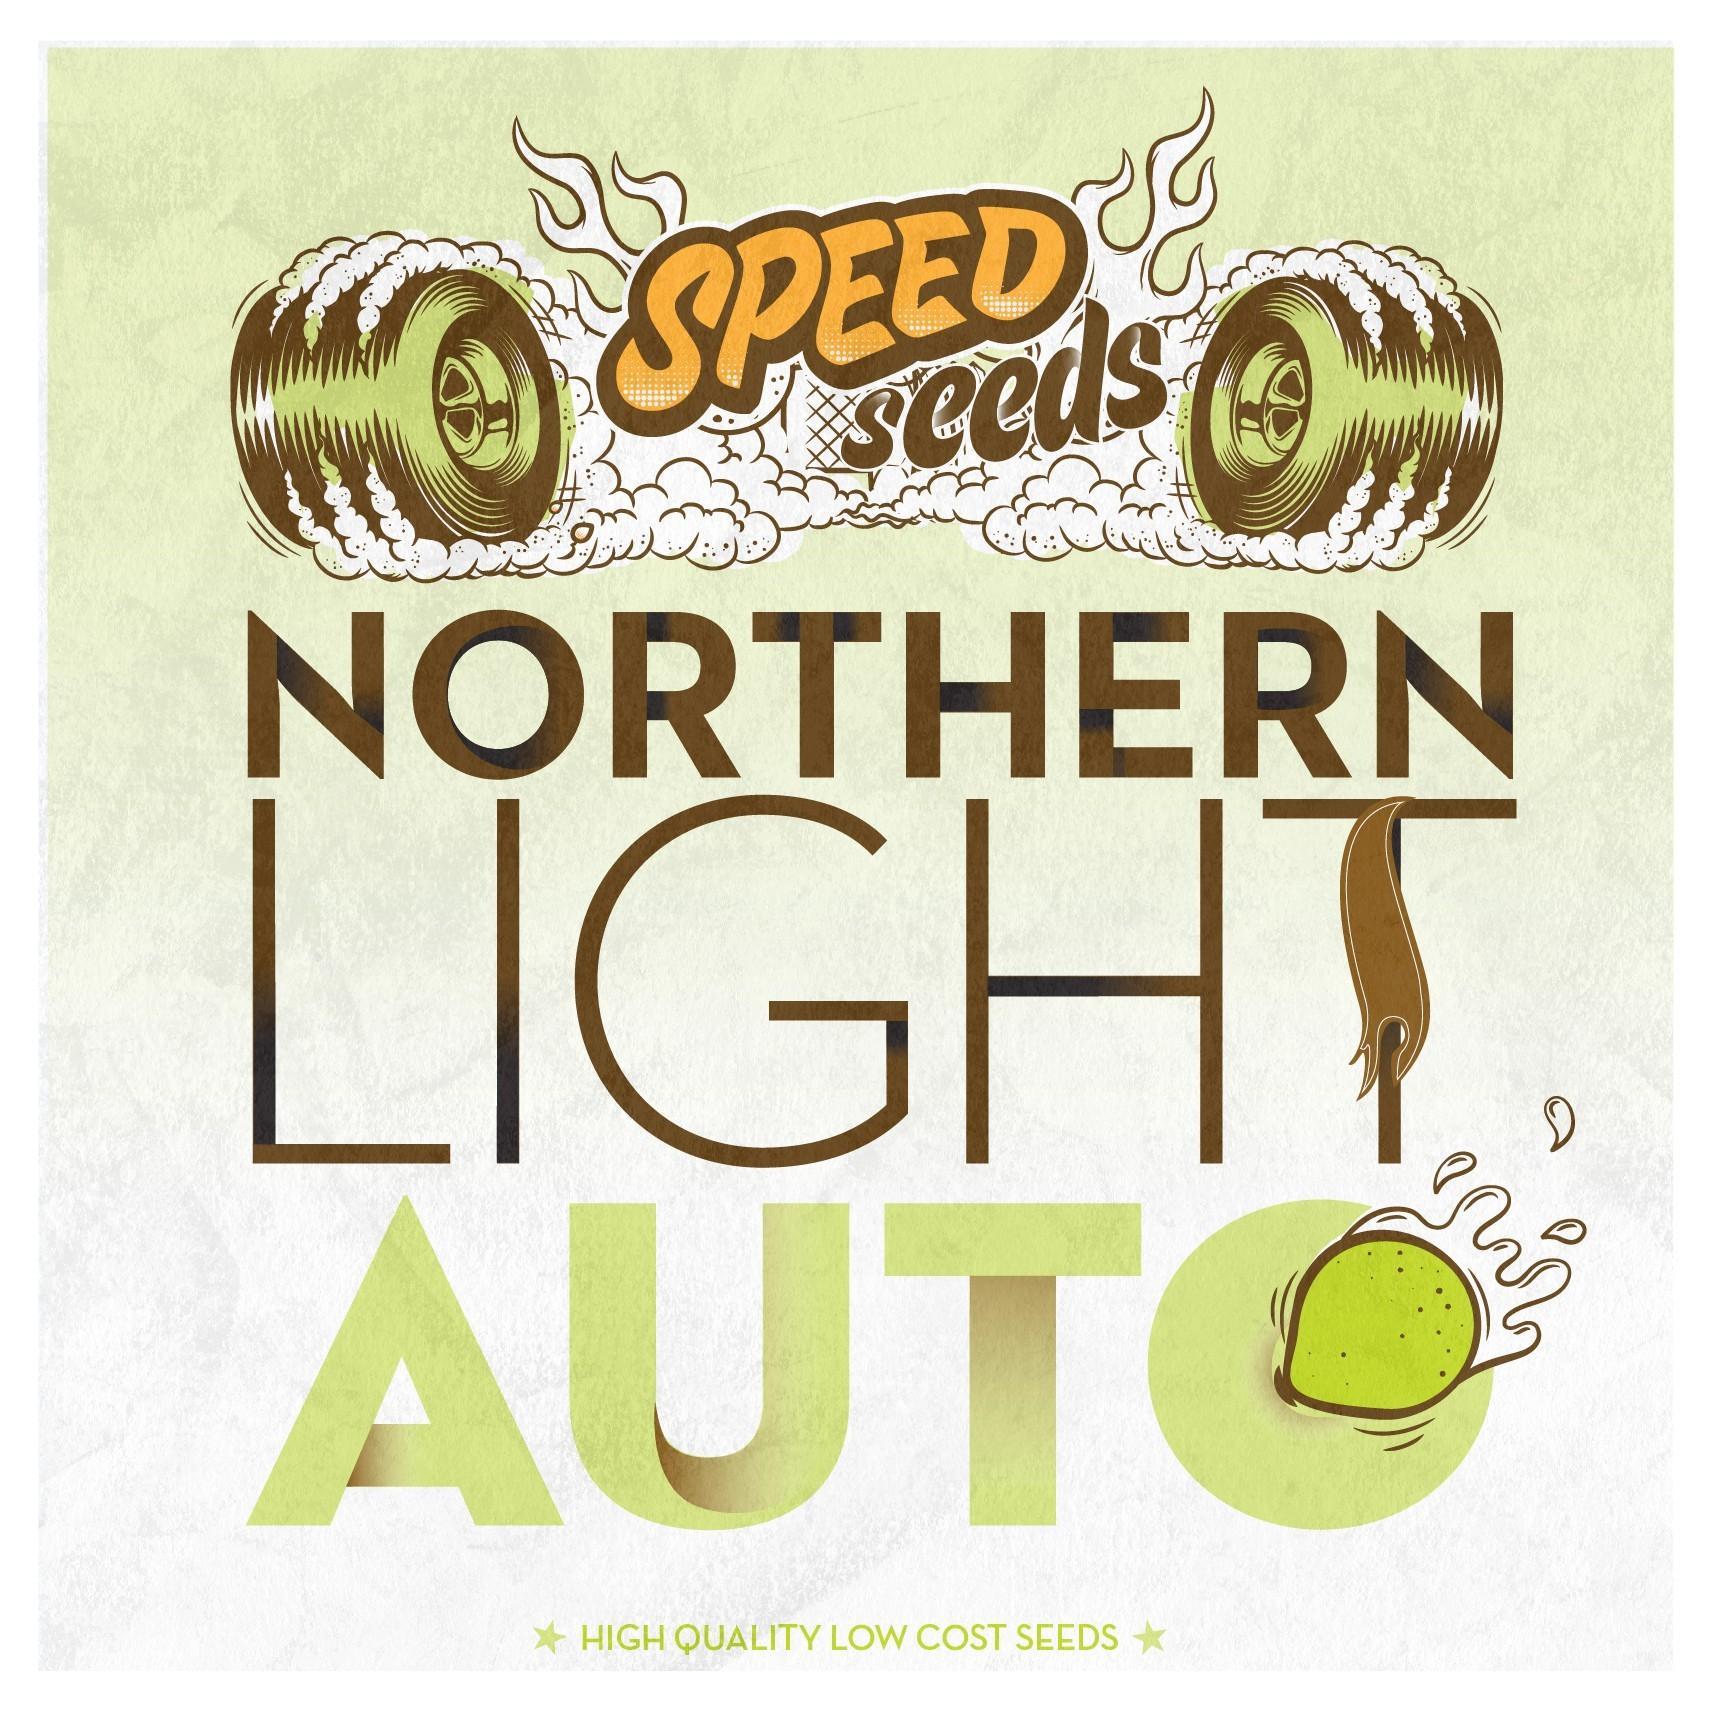 Northern Light Auto Speed Seeds Semilla feminizada marihuana barata granel 0